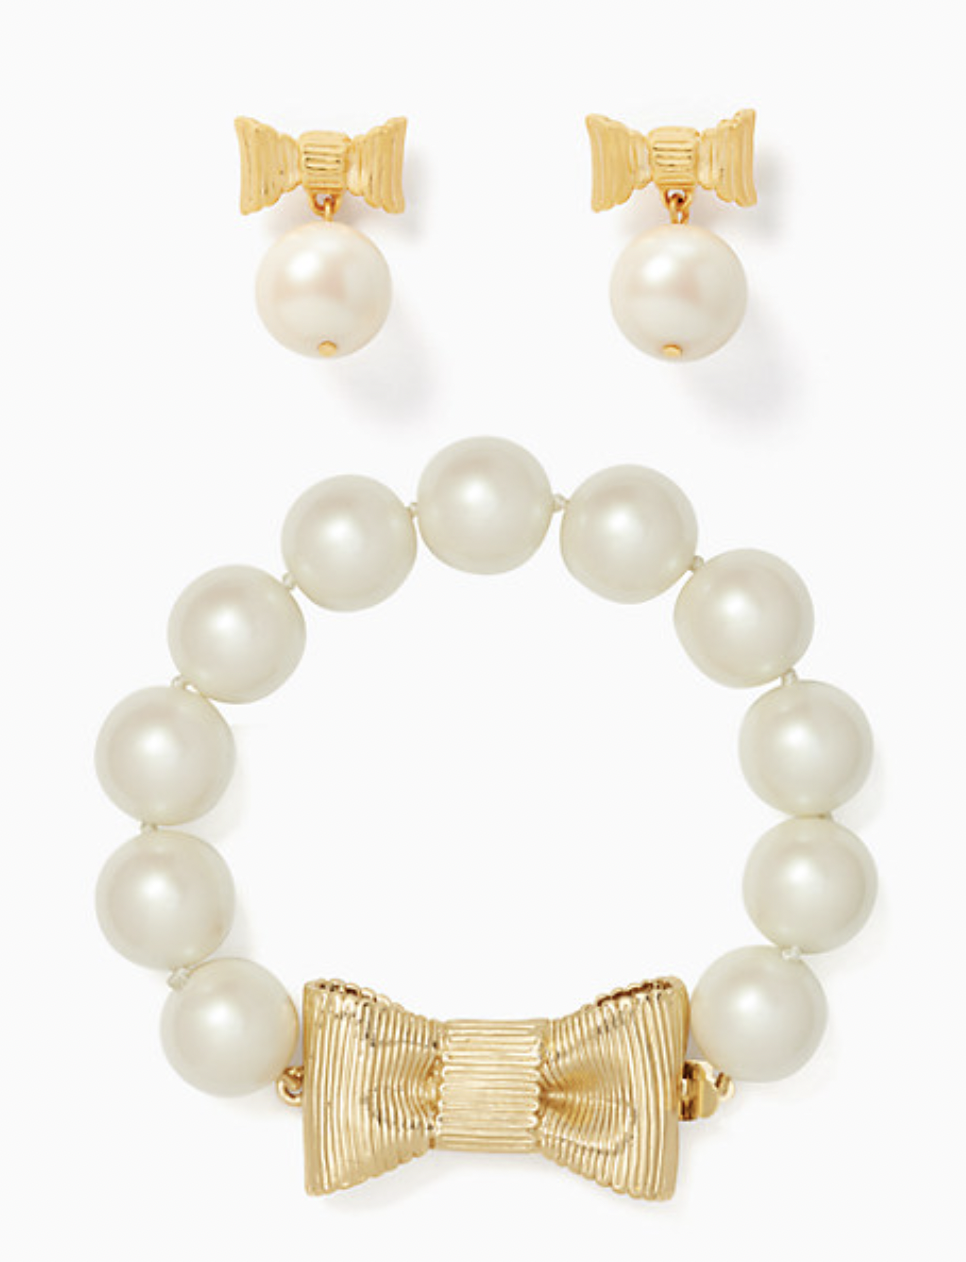 Kate Spade Wrapped in Pearl Bracelet Bundle